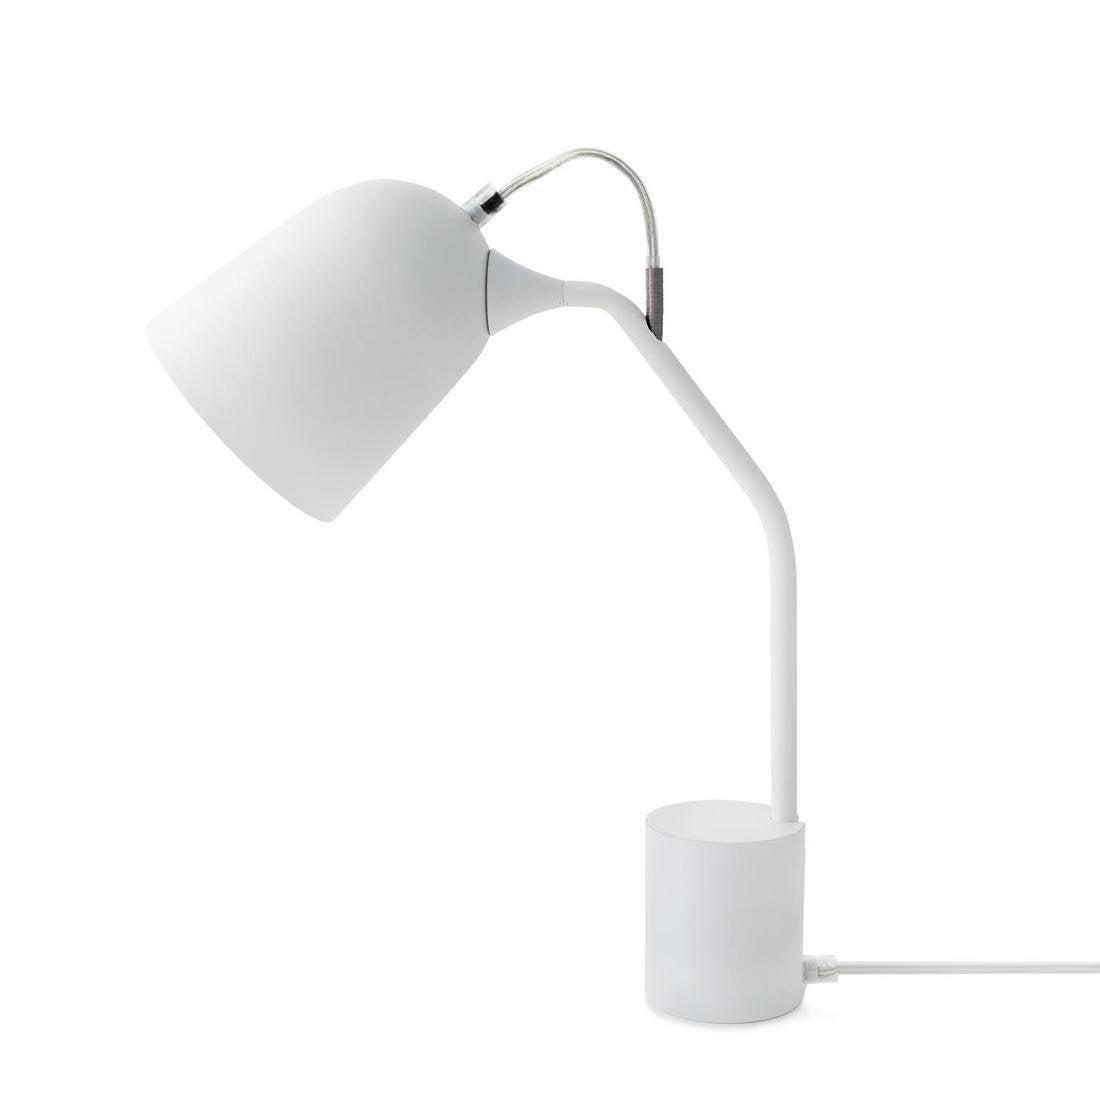 Lampe, pvc blanc, LO EDITIONS Magnétic Orientable